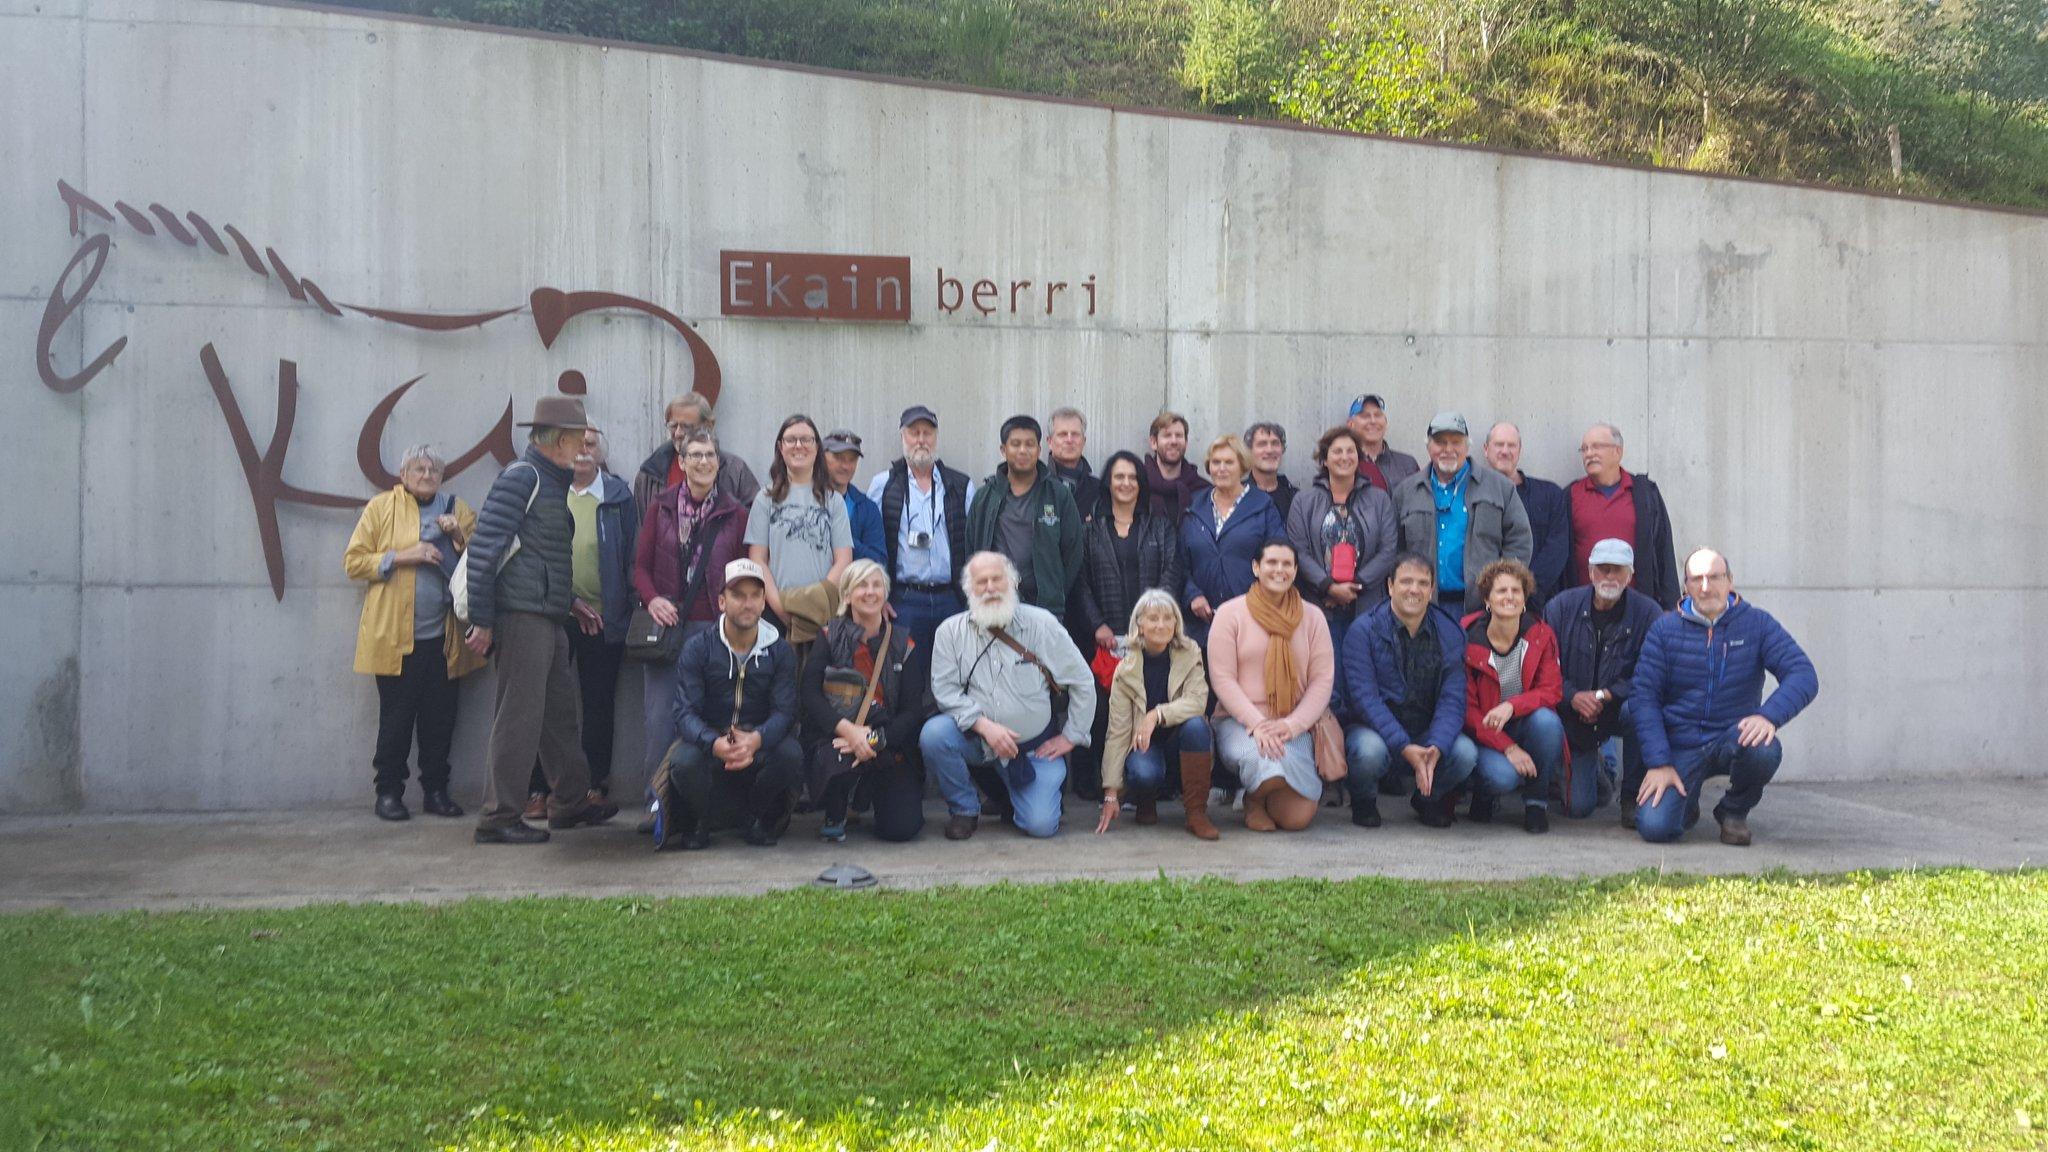 Ekainberri recibe la visita de expertos participantes en la III mesa redonda internacional de Rock Art Network (RAN)